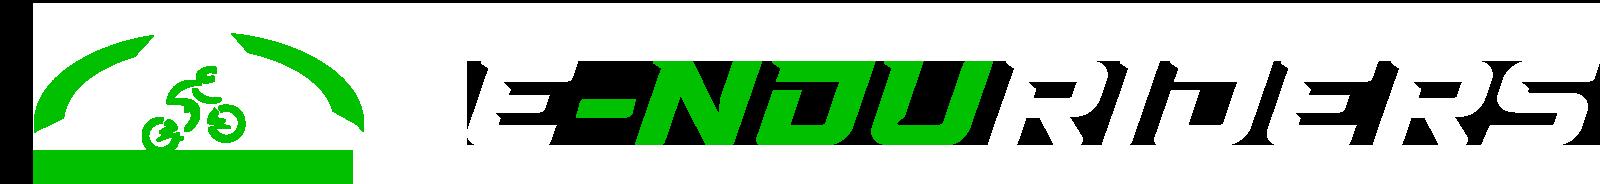 E-nduRiders